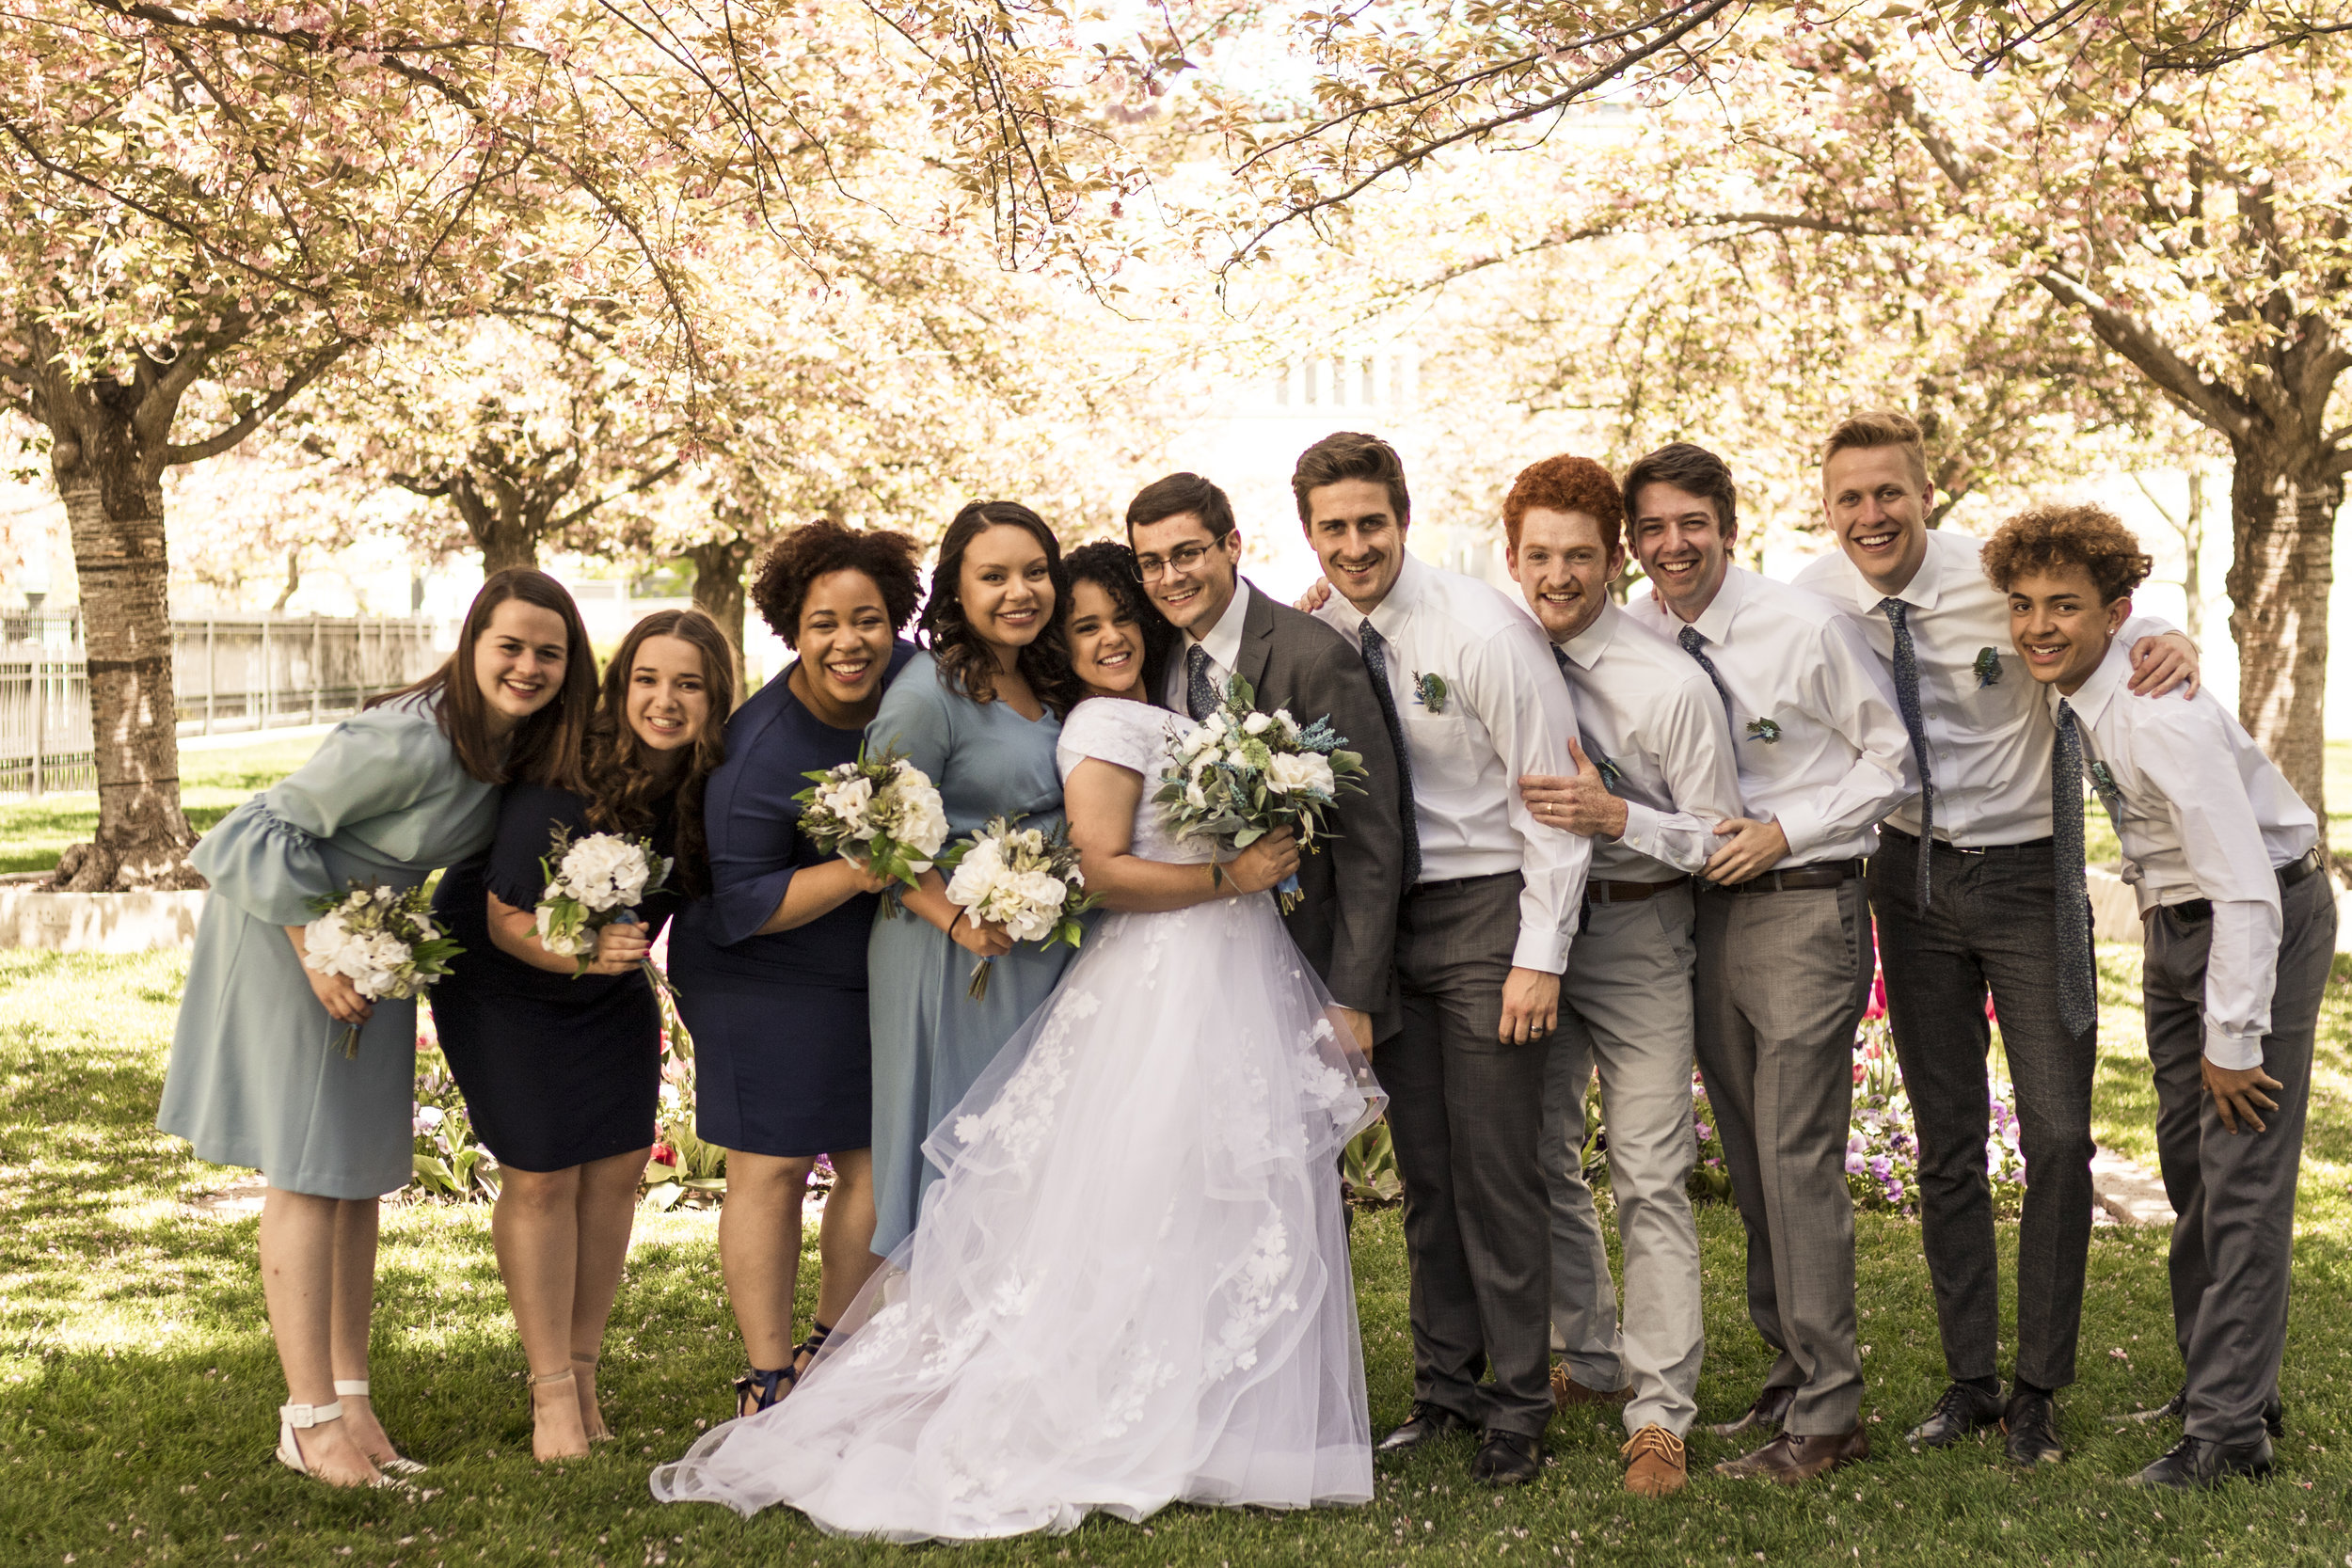 BBPhoto Utah Spring Wedding Salt Lake City Temple03.JPG